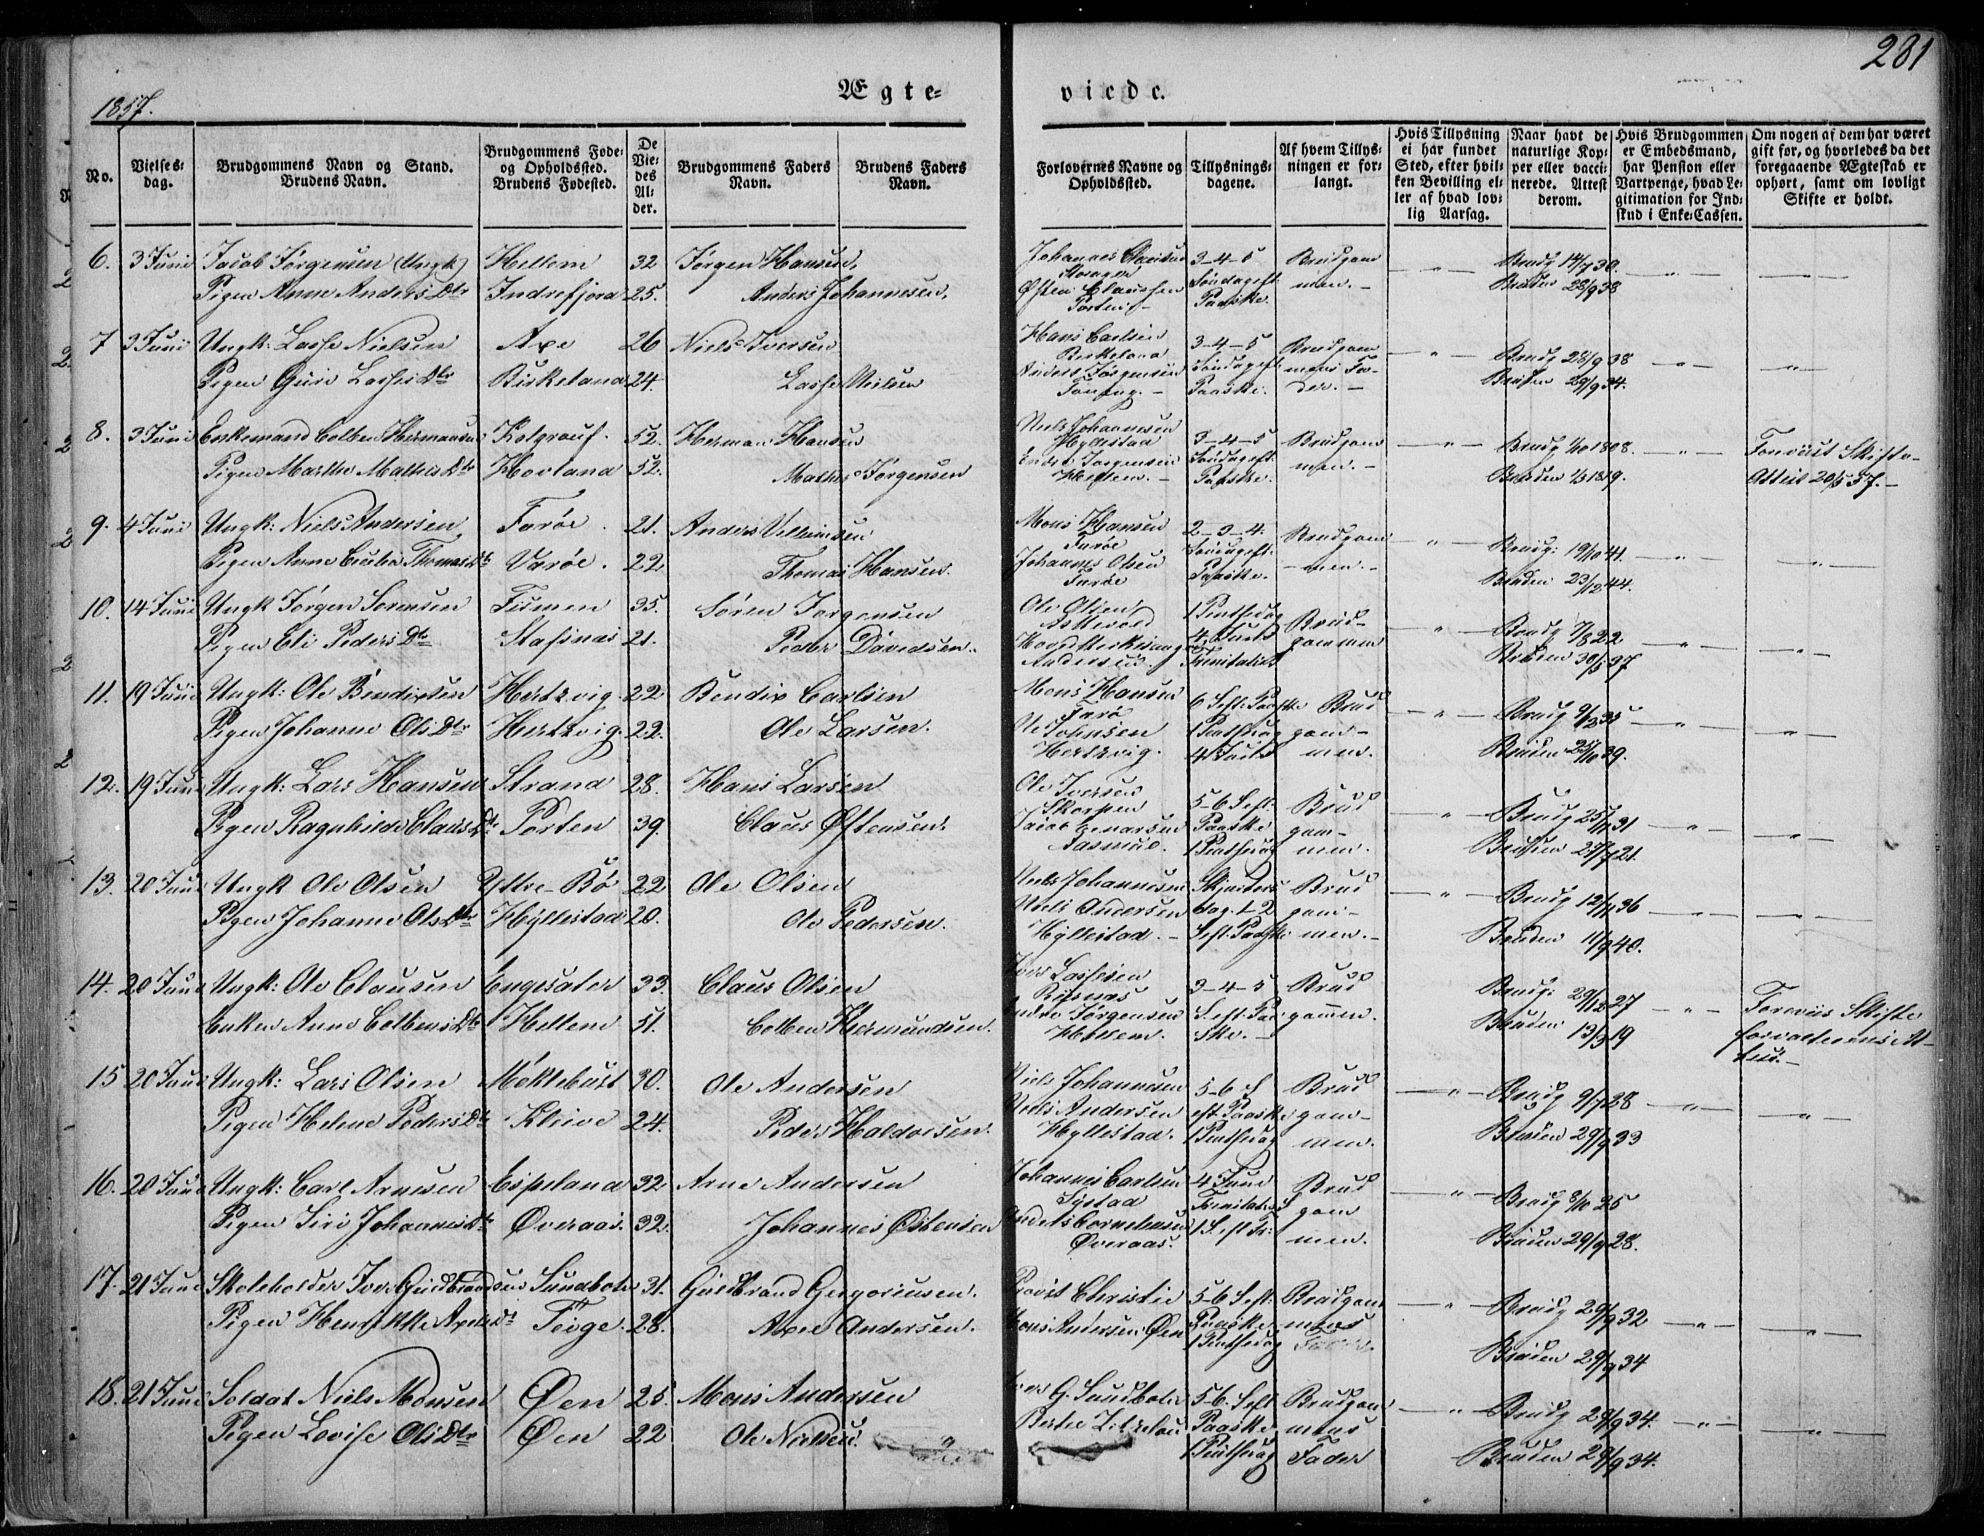 SAB, Askvoll Sokneprestembete, Ministerialbok nr. A 11 II, 1845-1878, s. 281